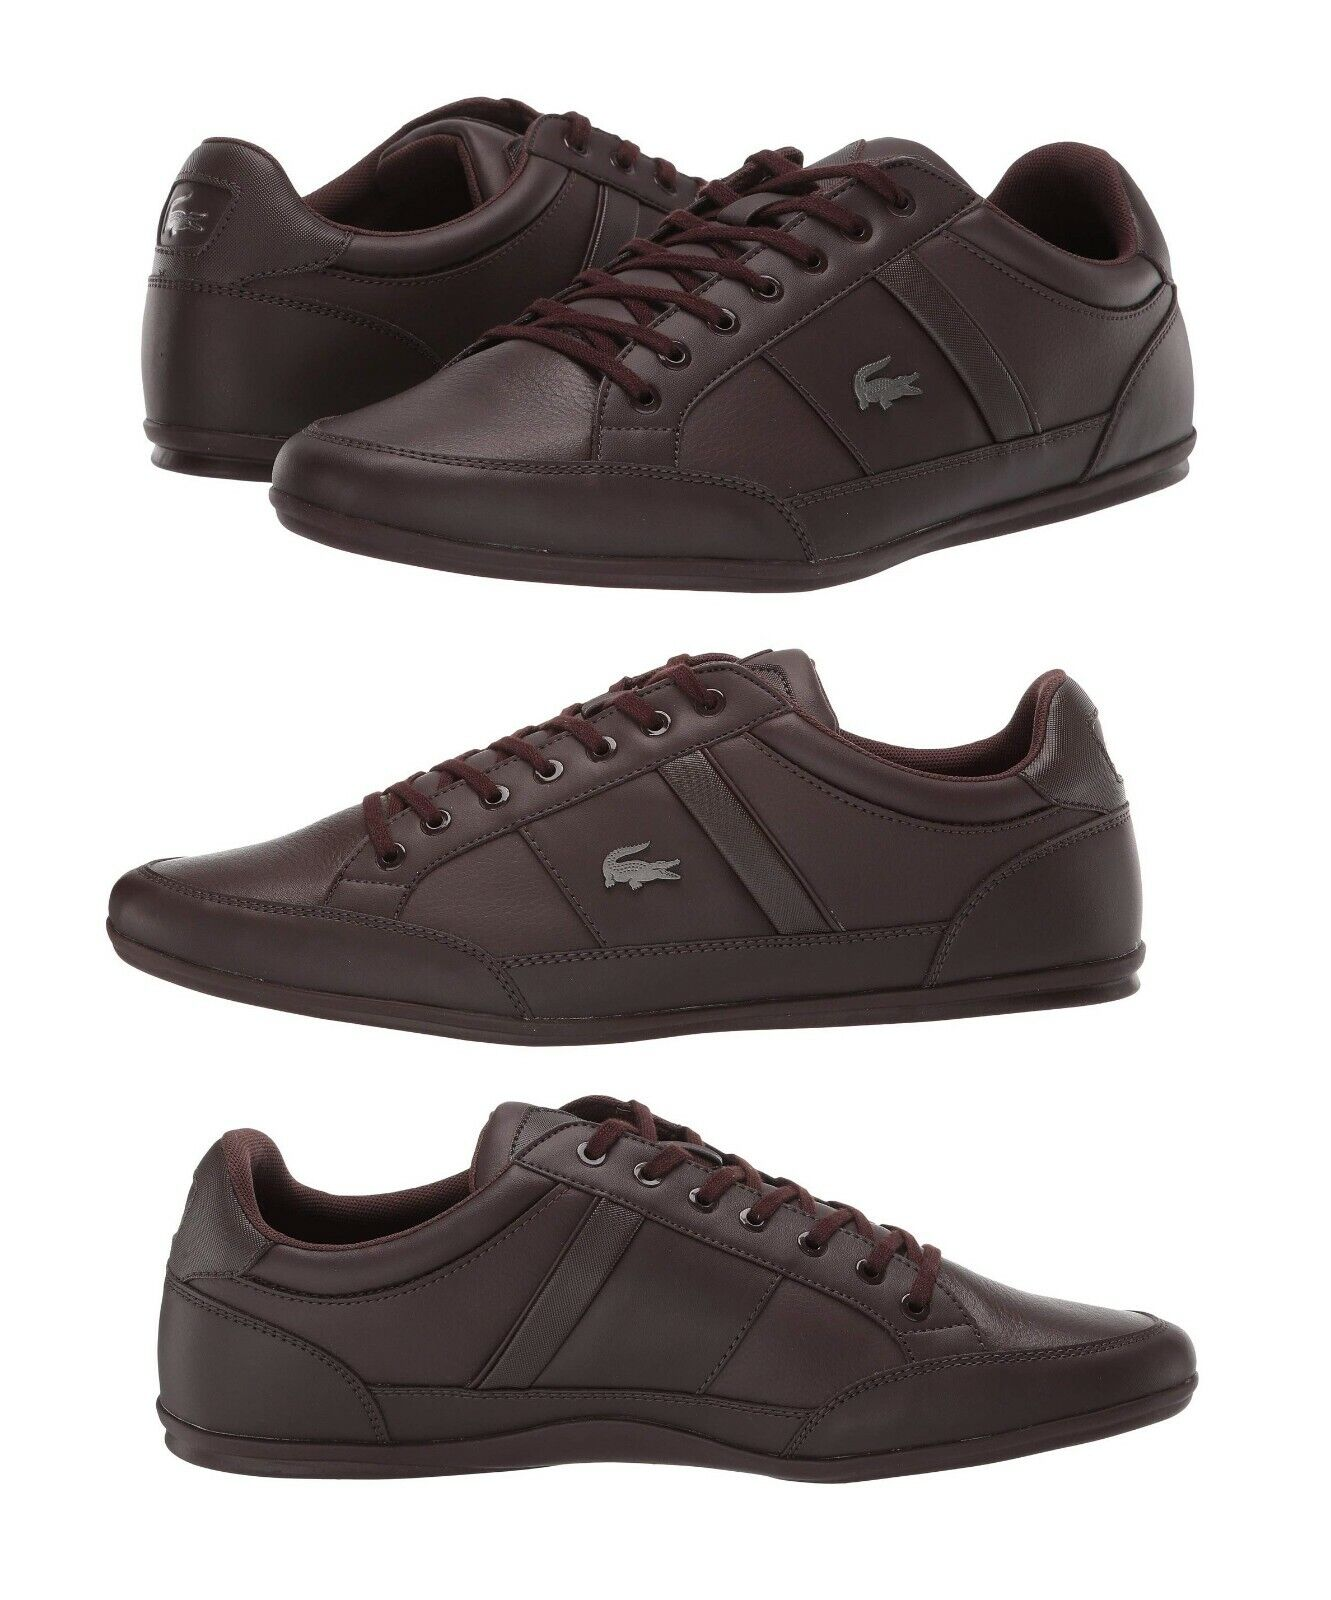 Lacoste Chaymon BL Men's Casual Croc Logo Shoes Sneakers Black Brown Navy White 1